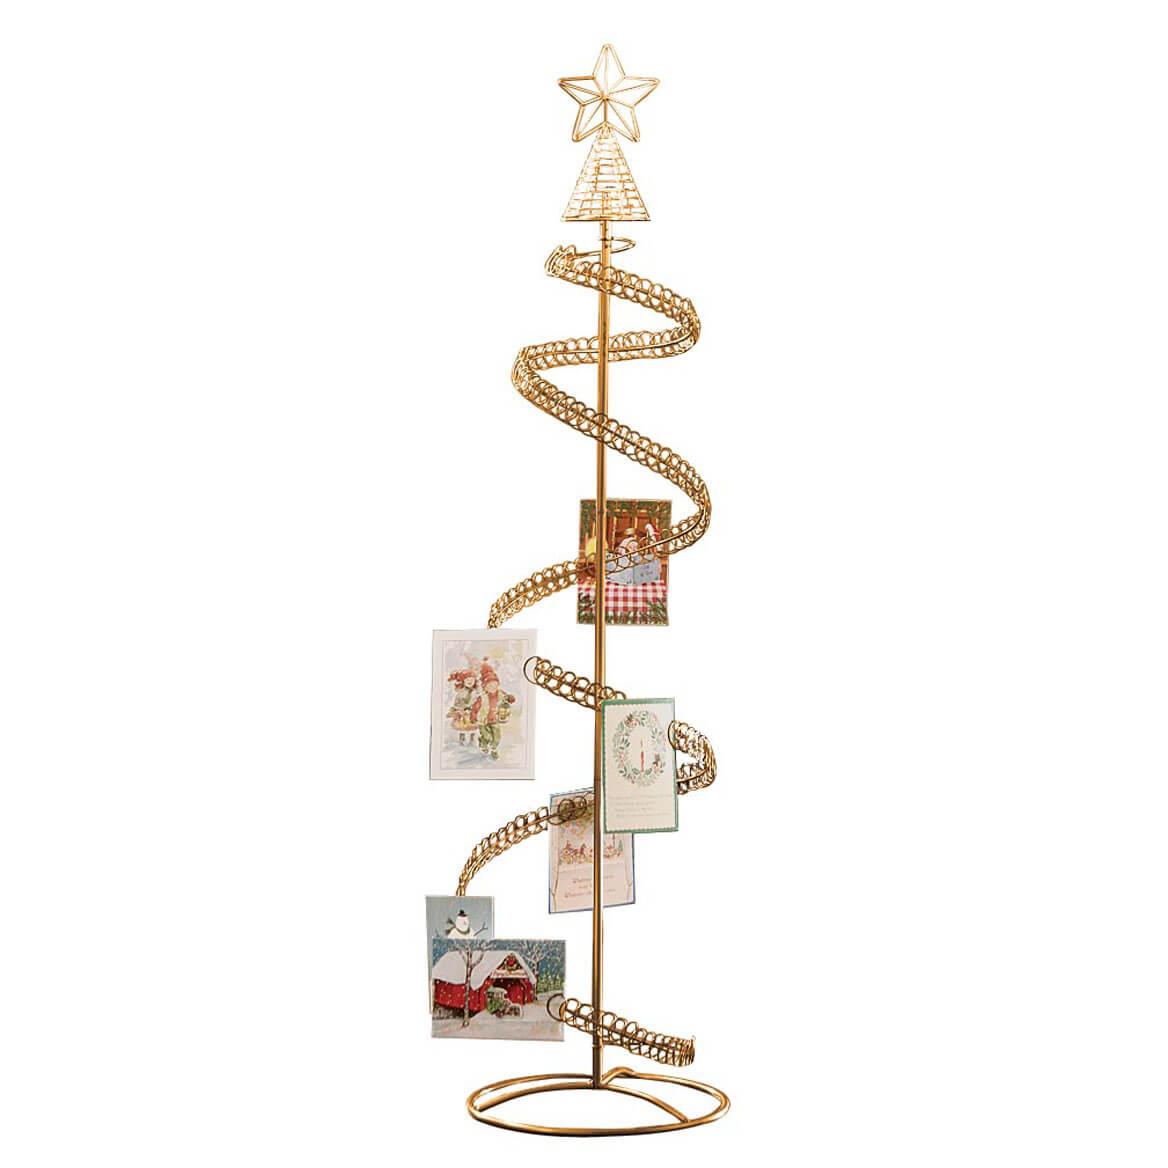 Spiral Tree Card Holder - Christmas Card Tree Holder - Walter Drake